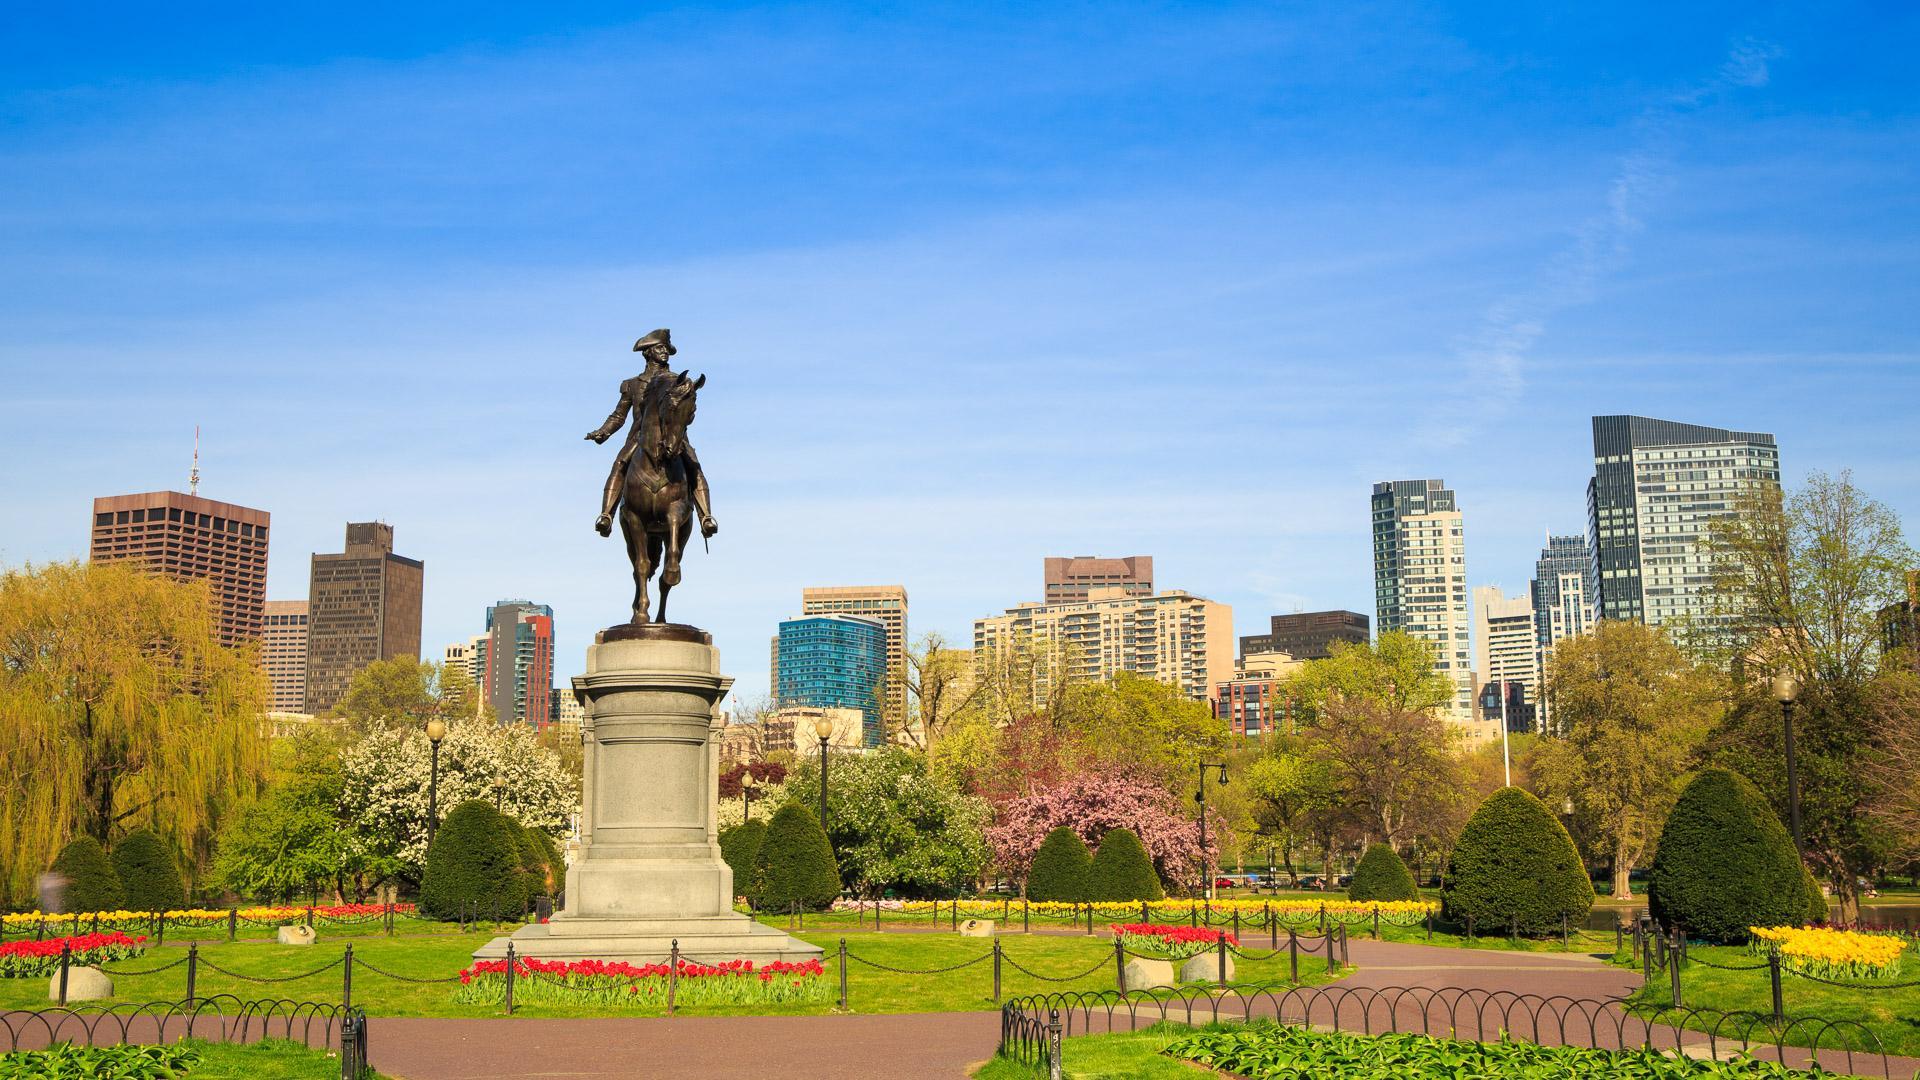 Boston Public Garden and statue of George Washington.